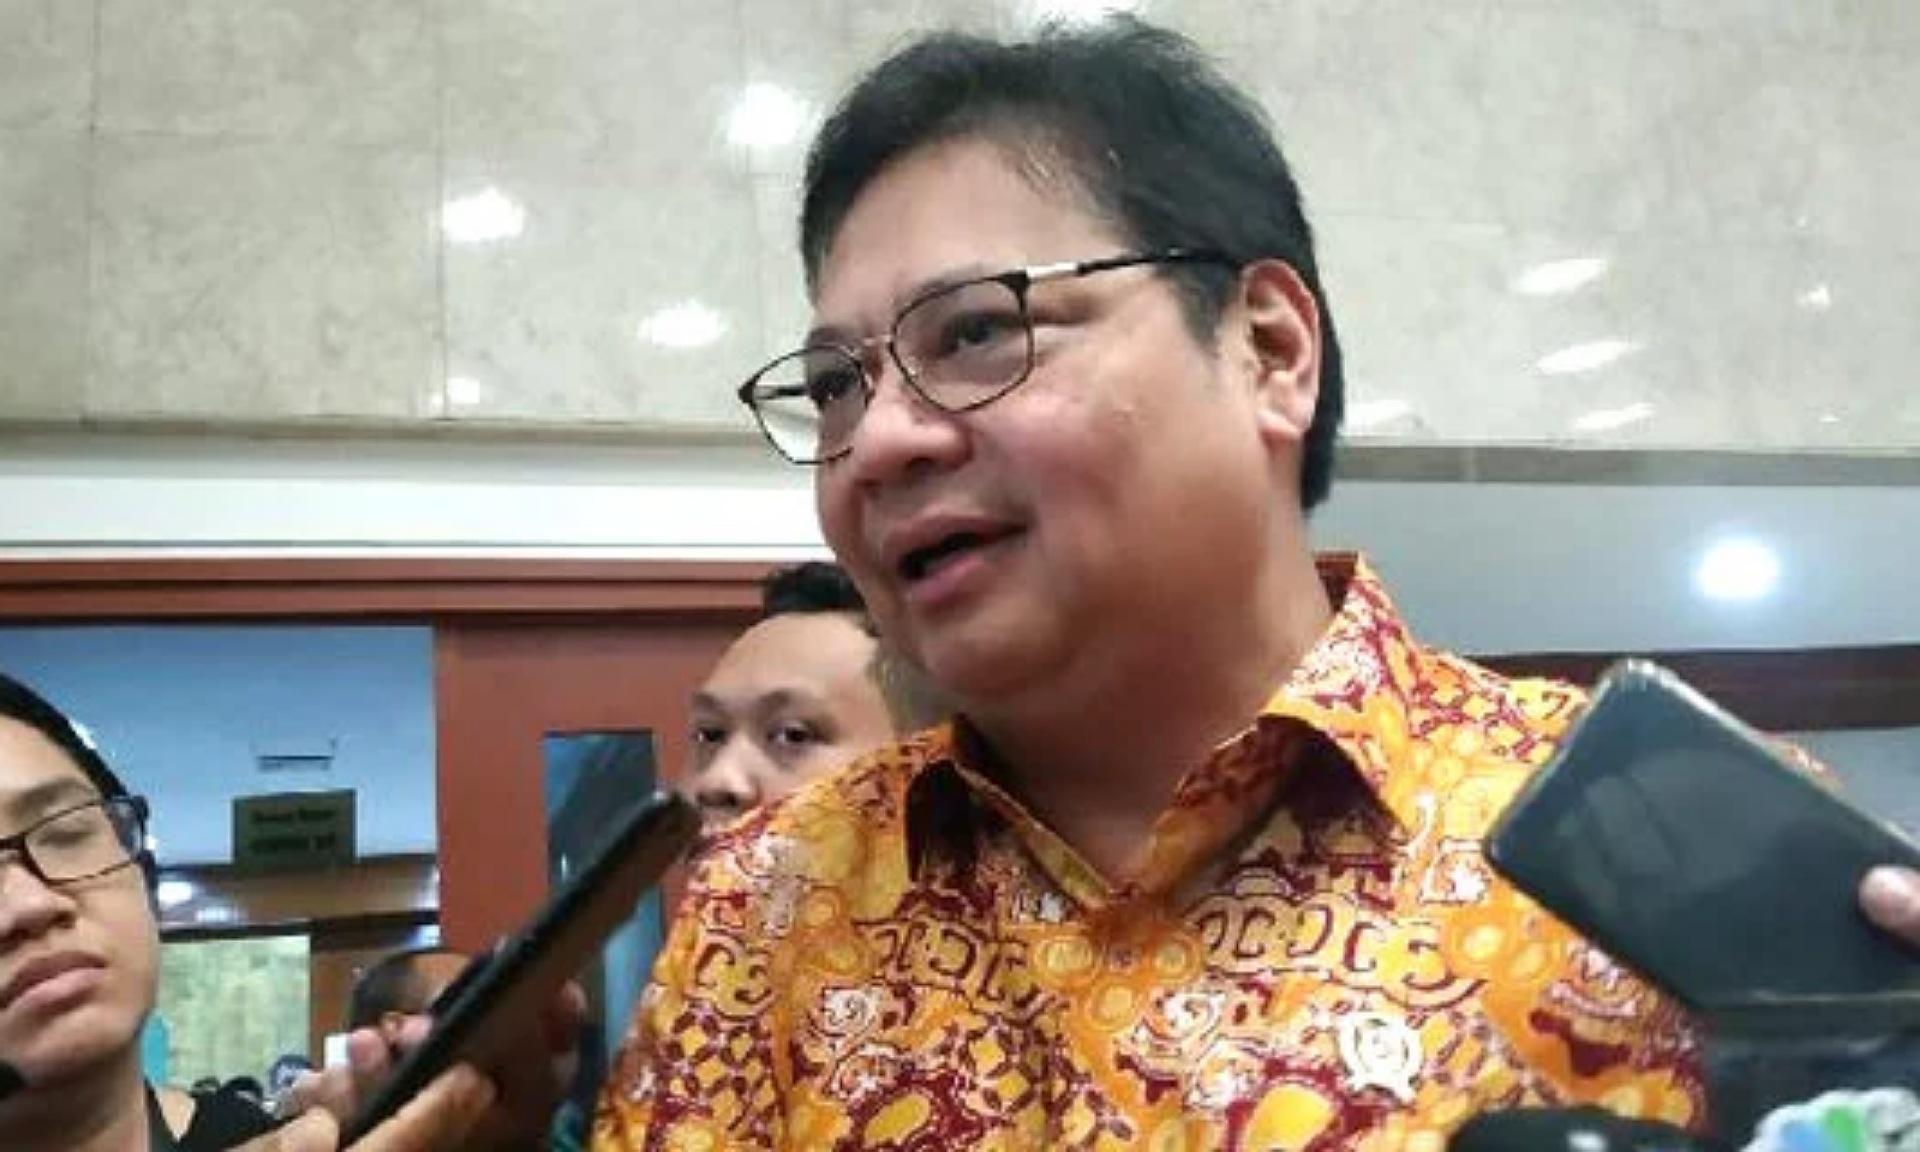 Berisi 2 Ribu Halaman, Menko Airlangga Ungkap Draft RUU Omnibus Law Telah Selesai